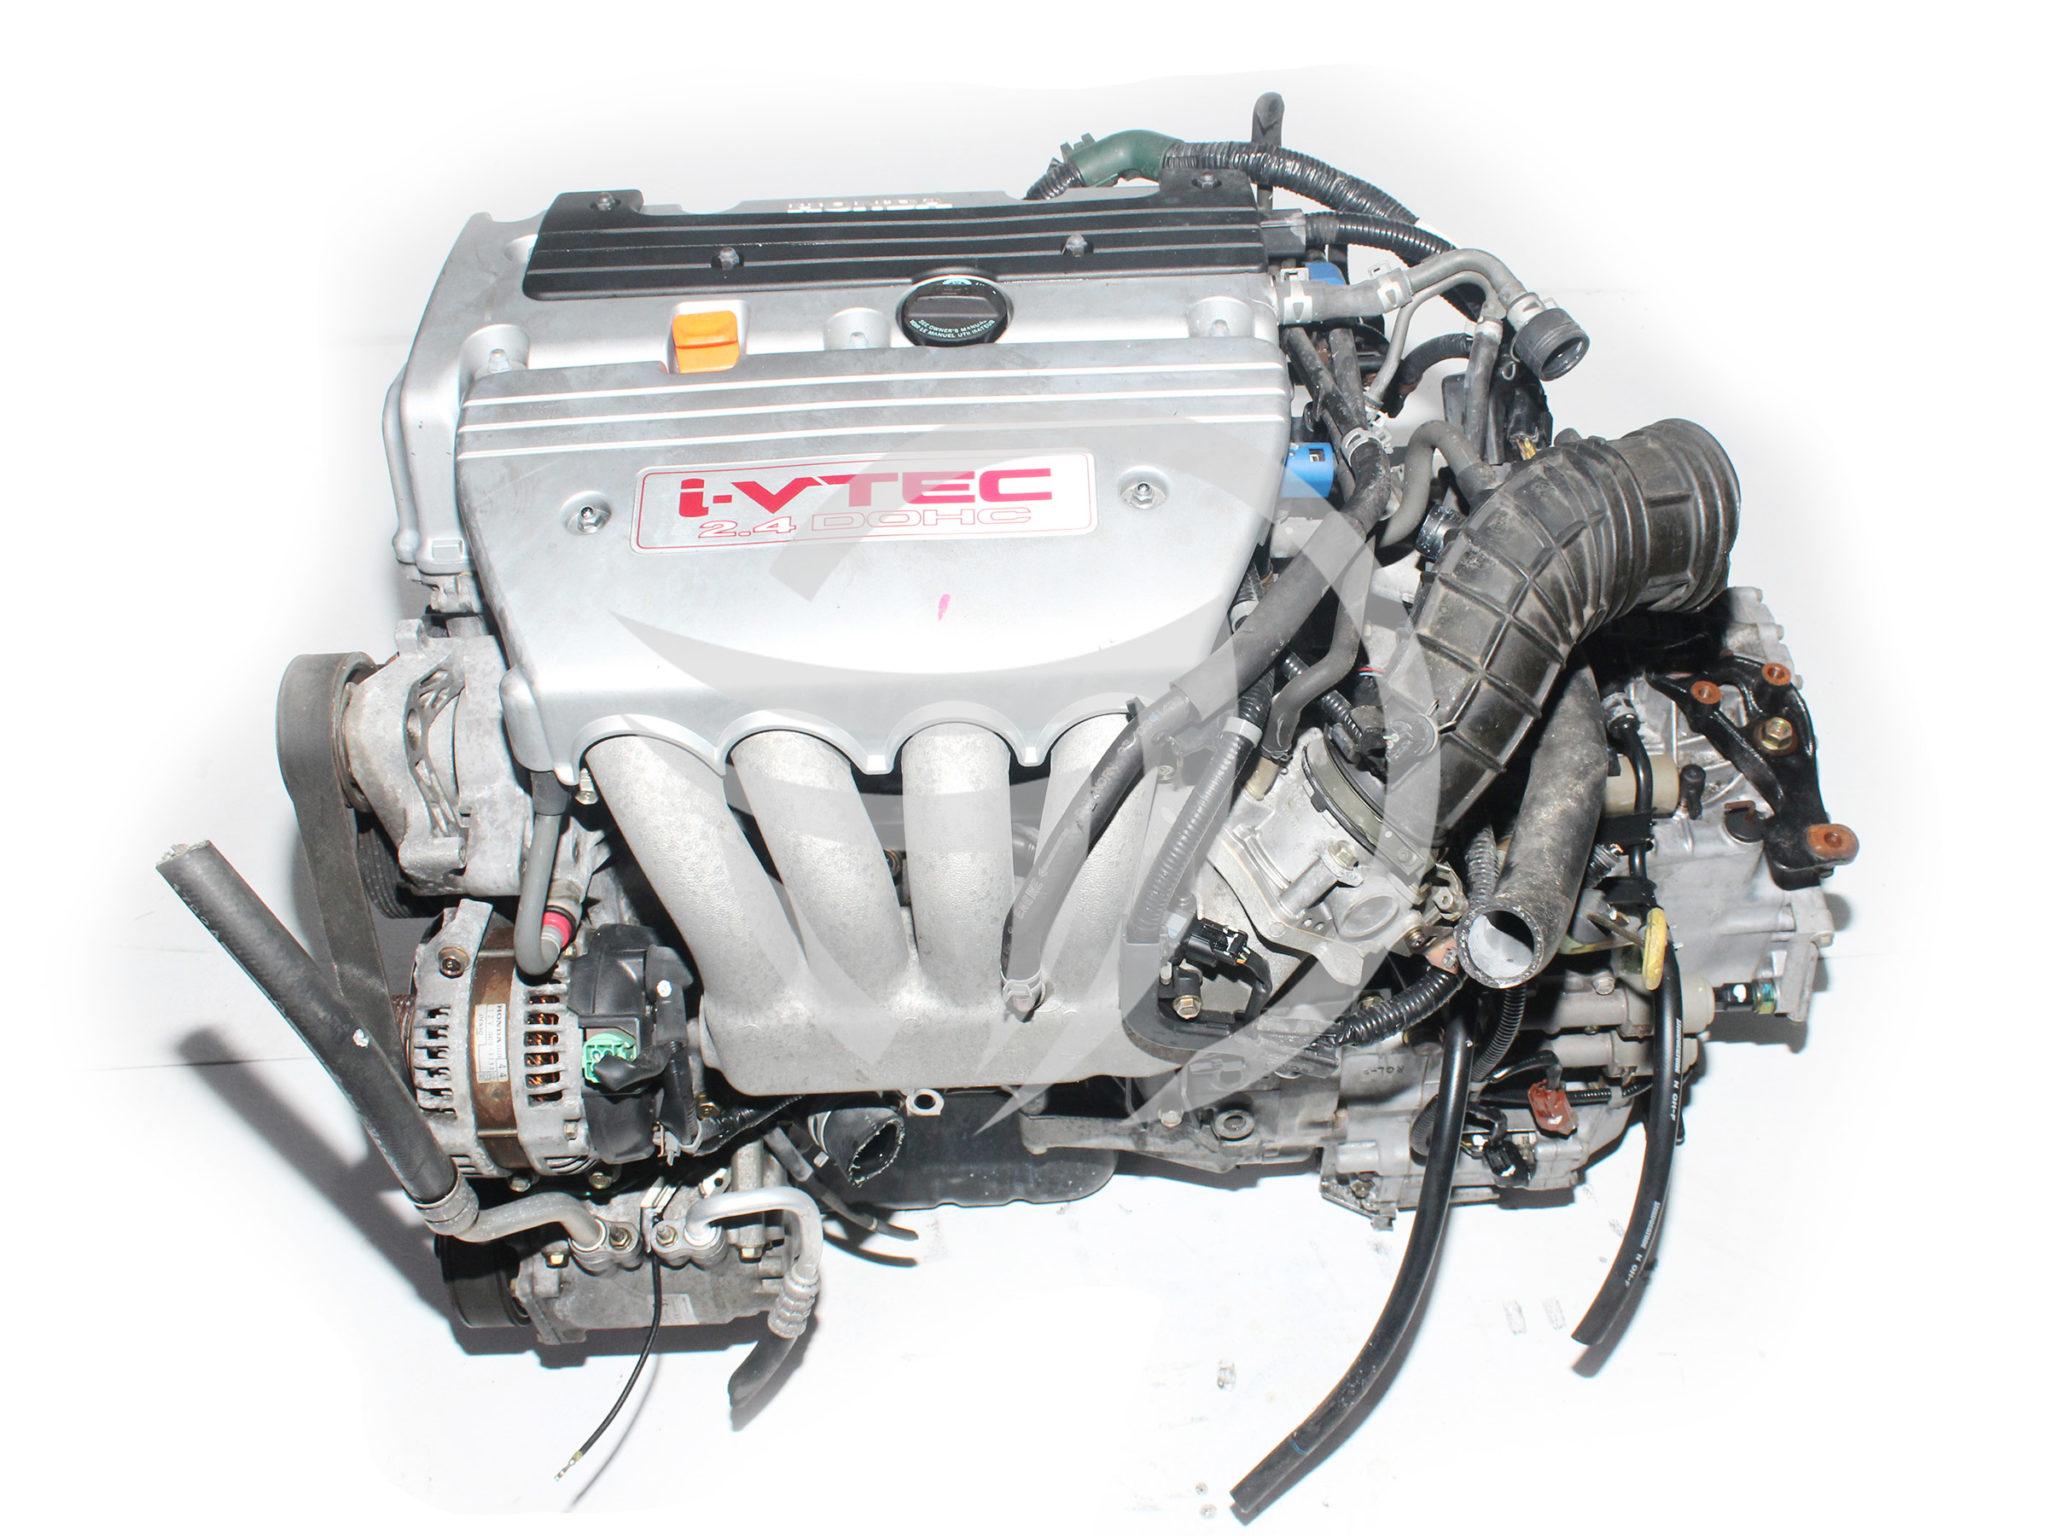 03 04 05 06 07 Acura Tsx 2 4l Dohc 4 Cylinder 3 Lobe I Vtec Engine Jdm K24a